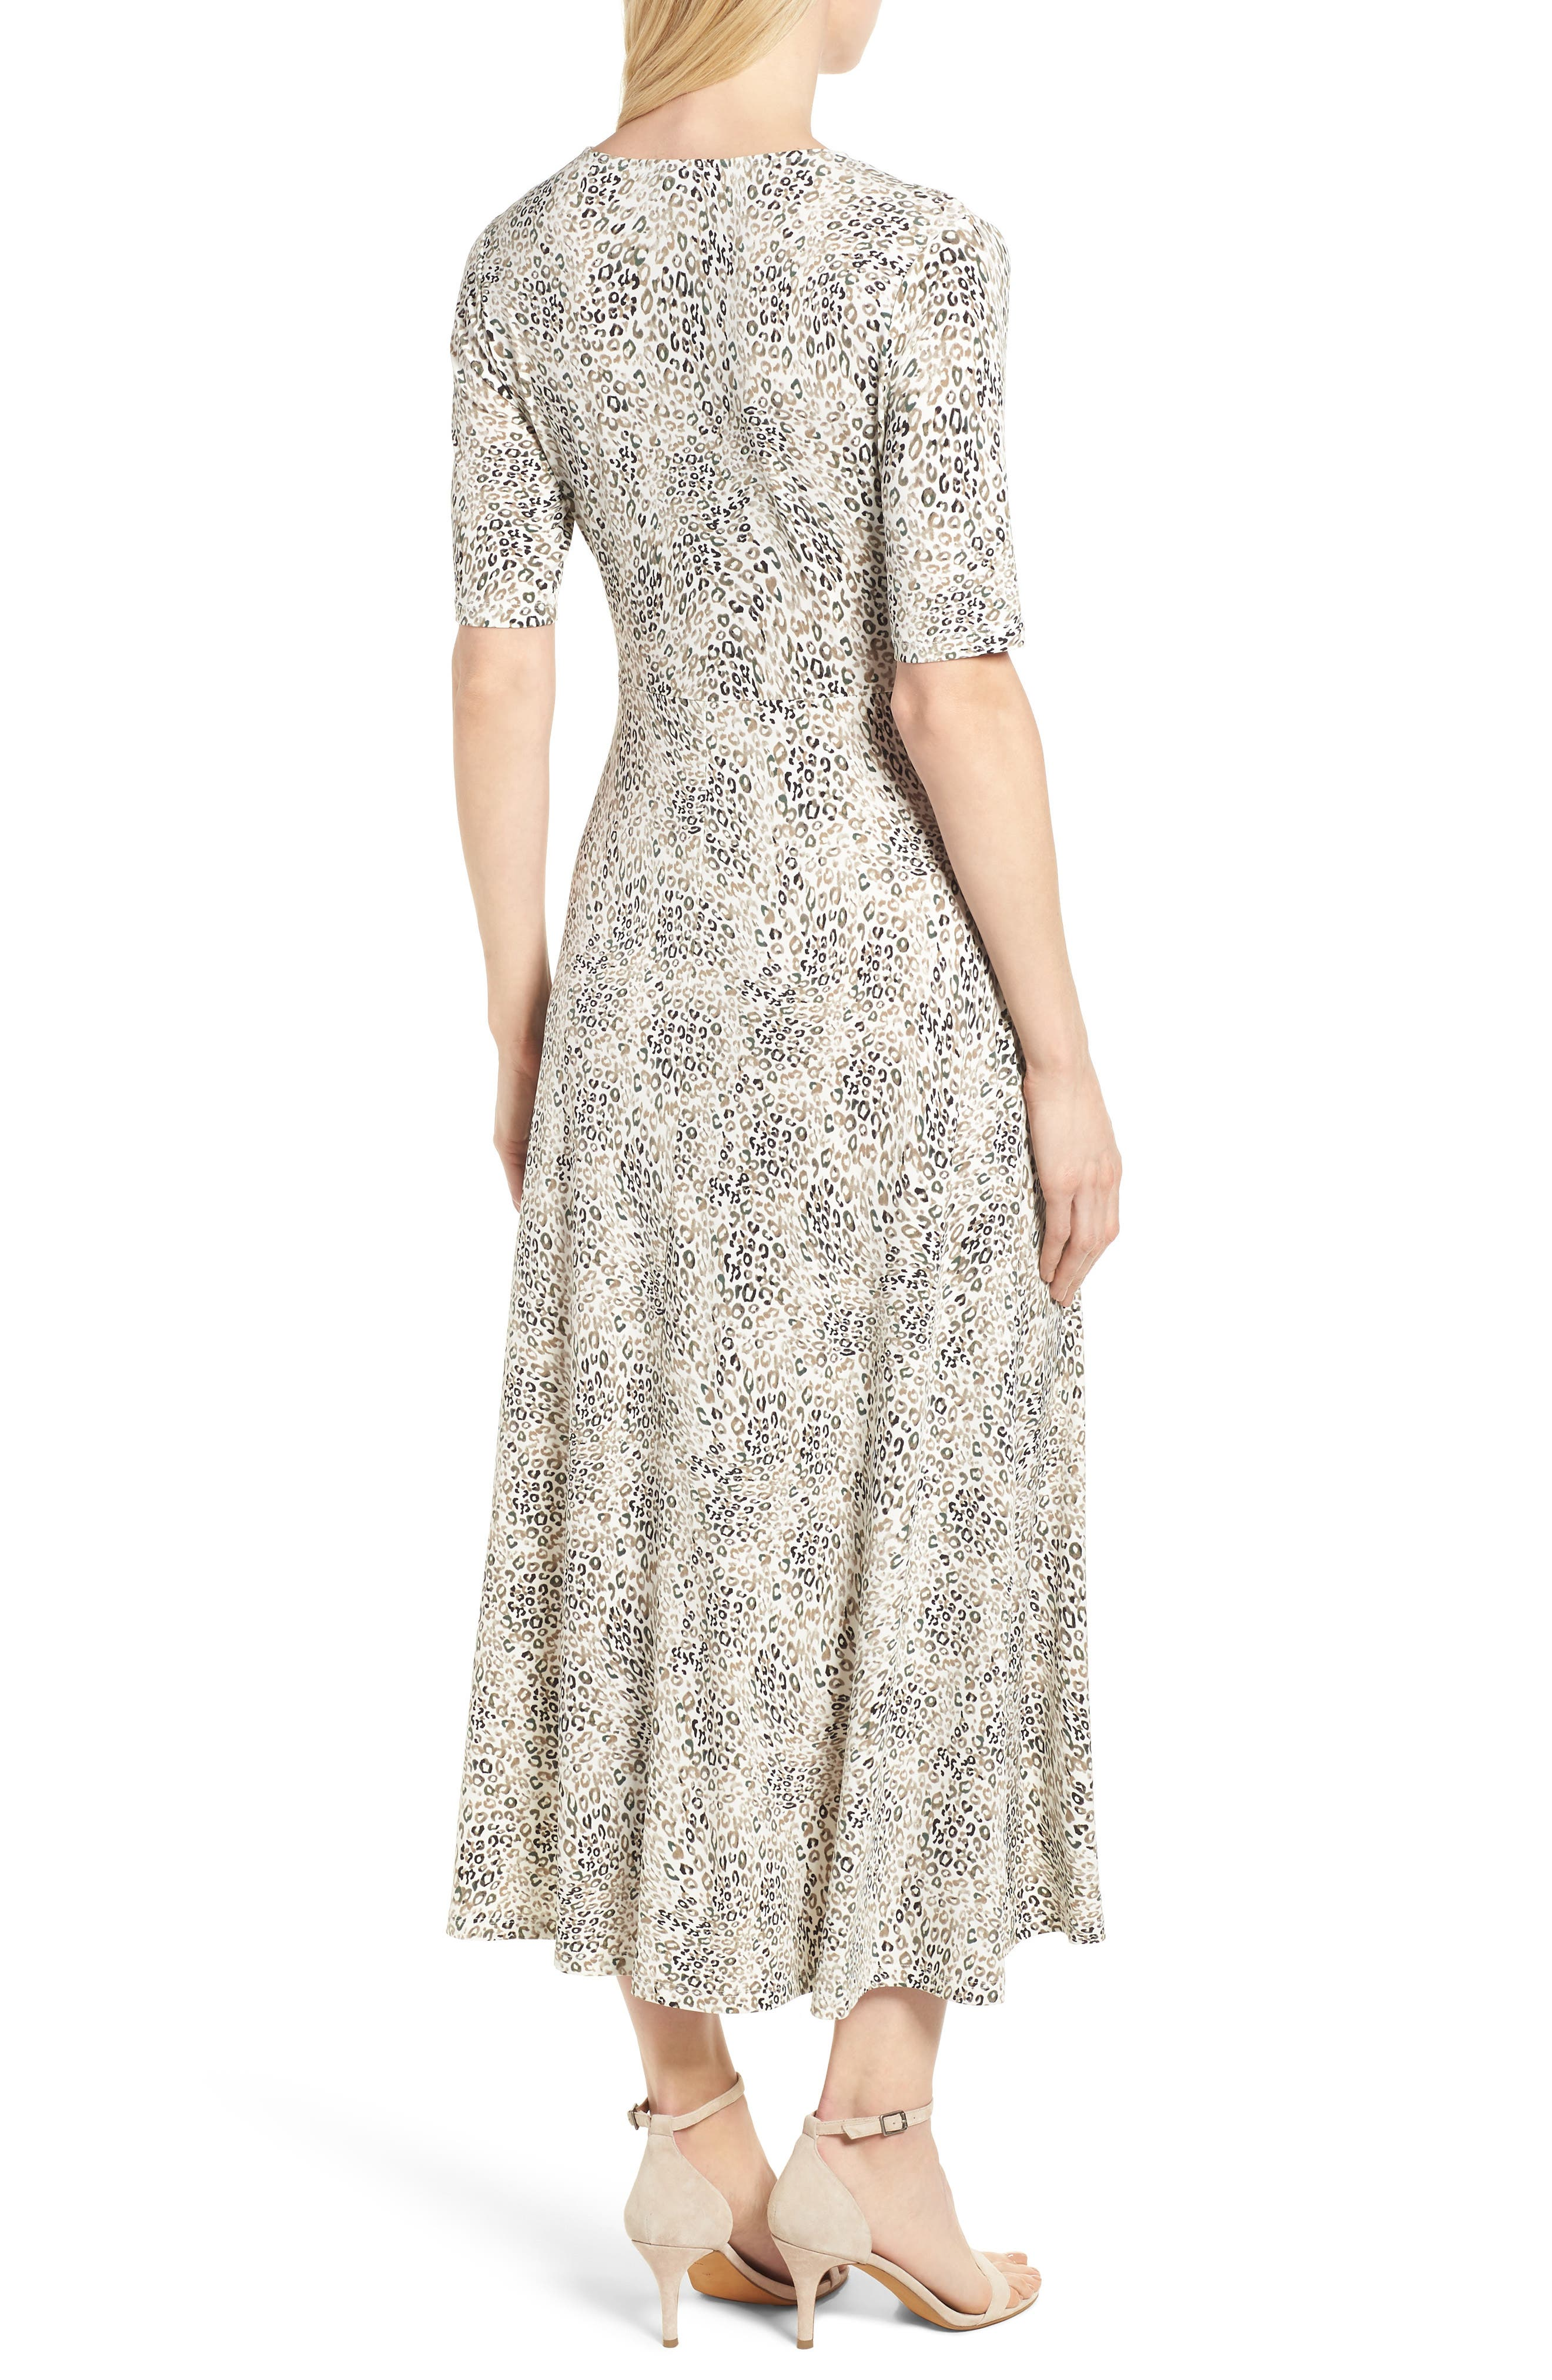 Leopard Print Maxi Dress,                             Alternate thumbnail 2, color,                             103-New Ivory